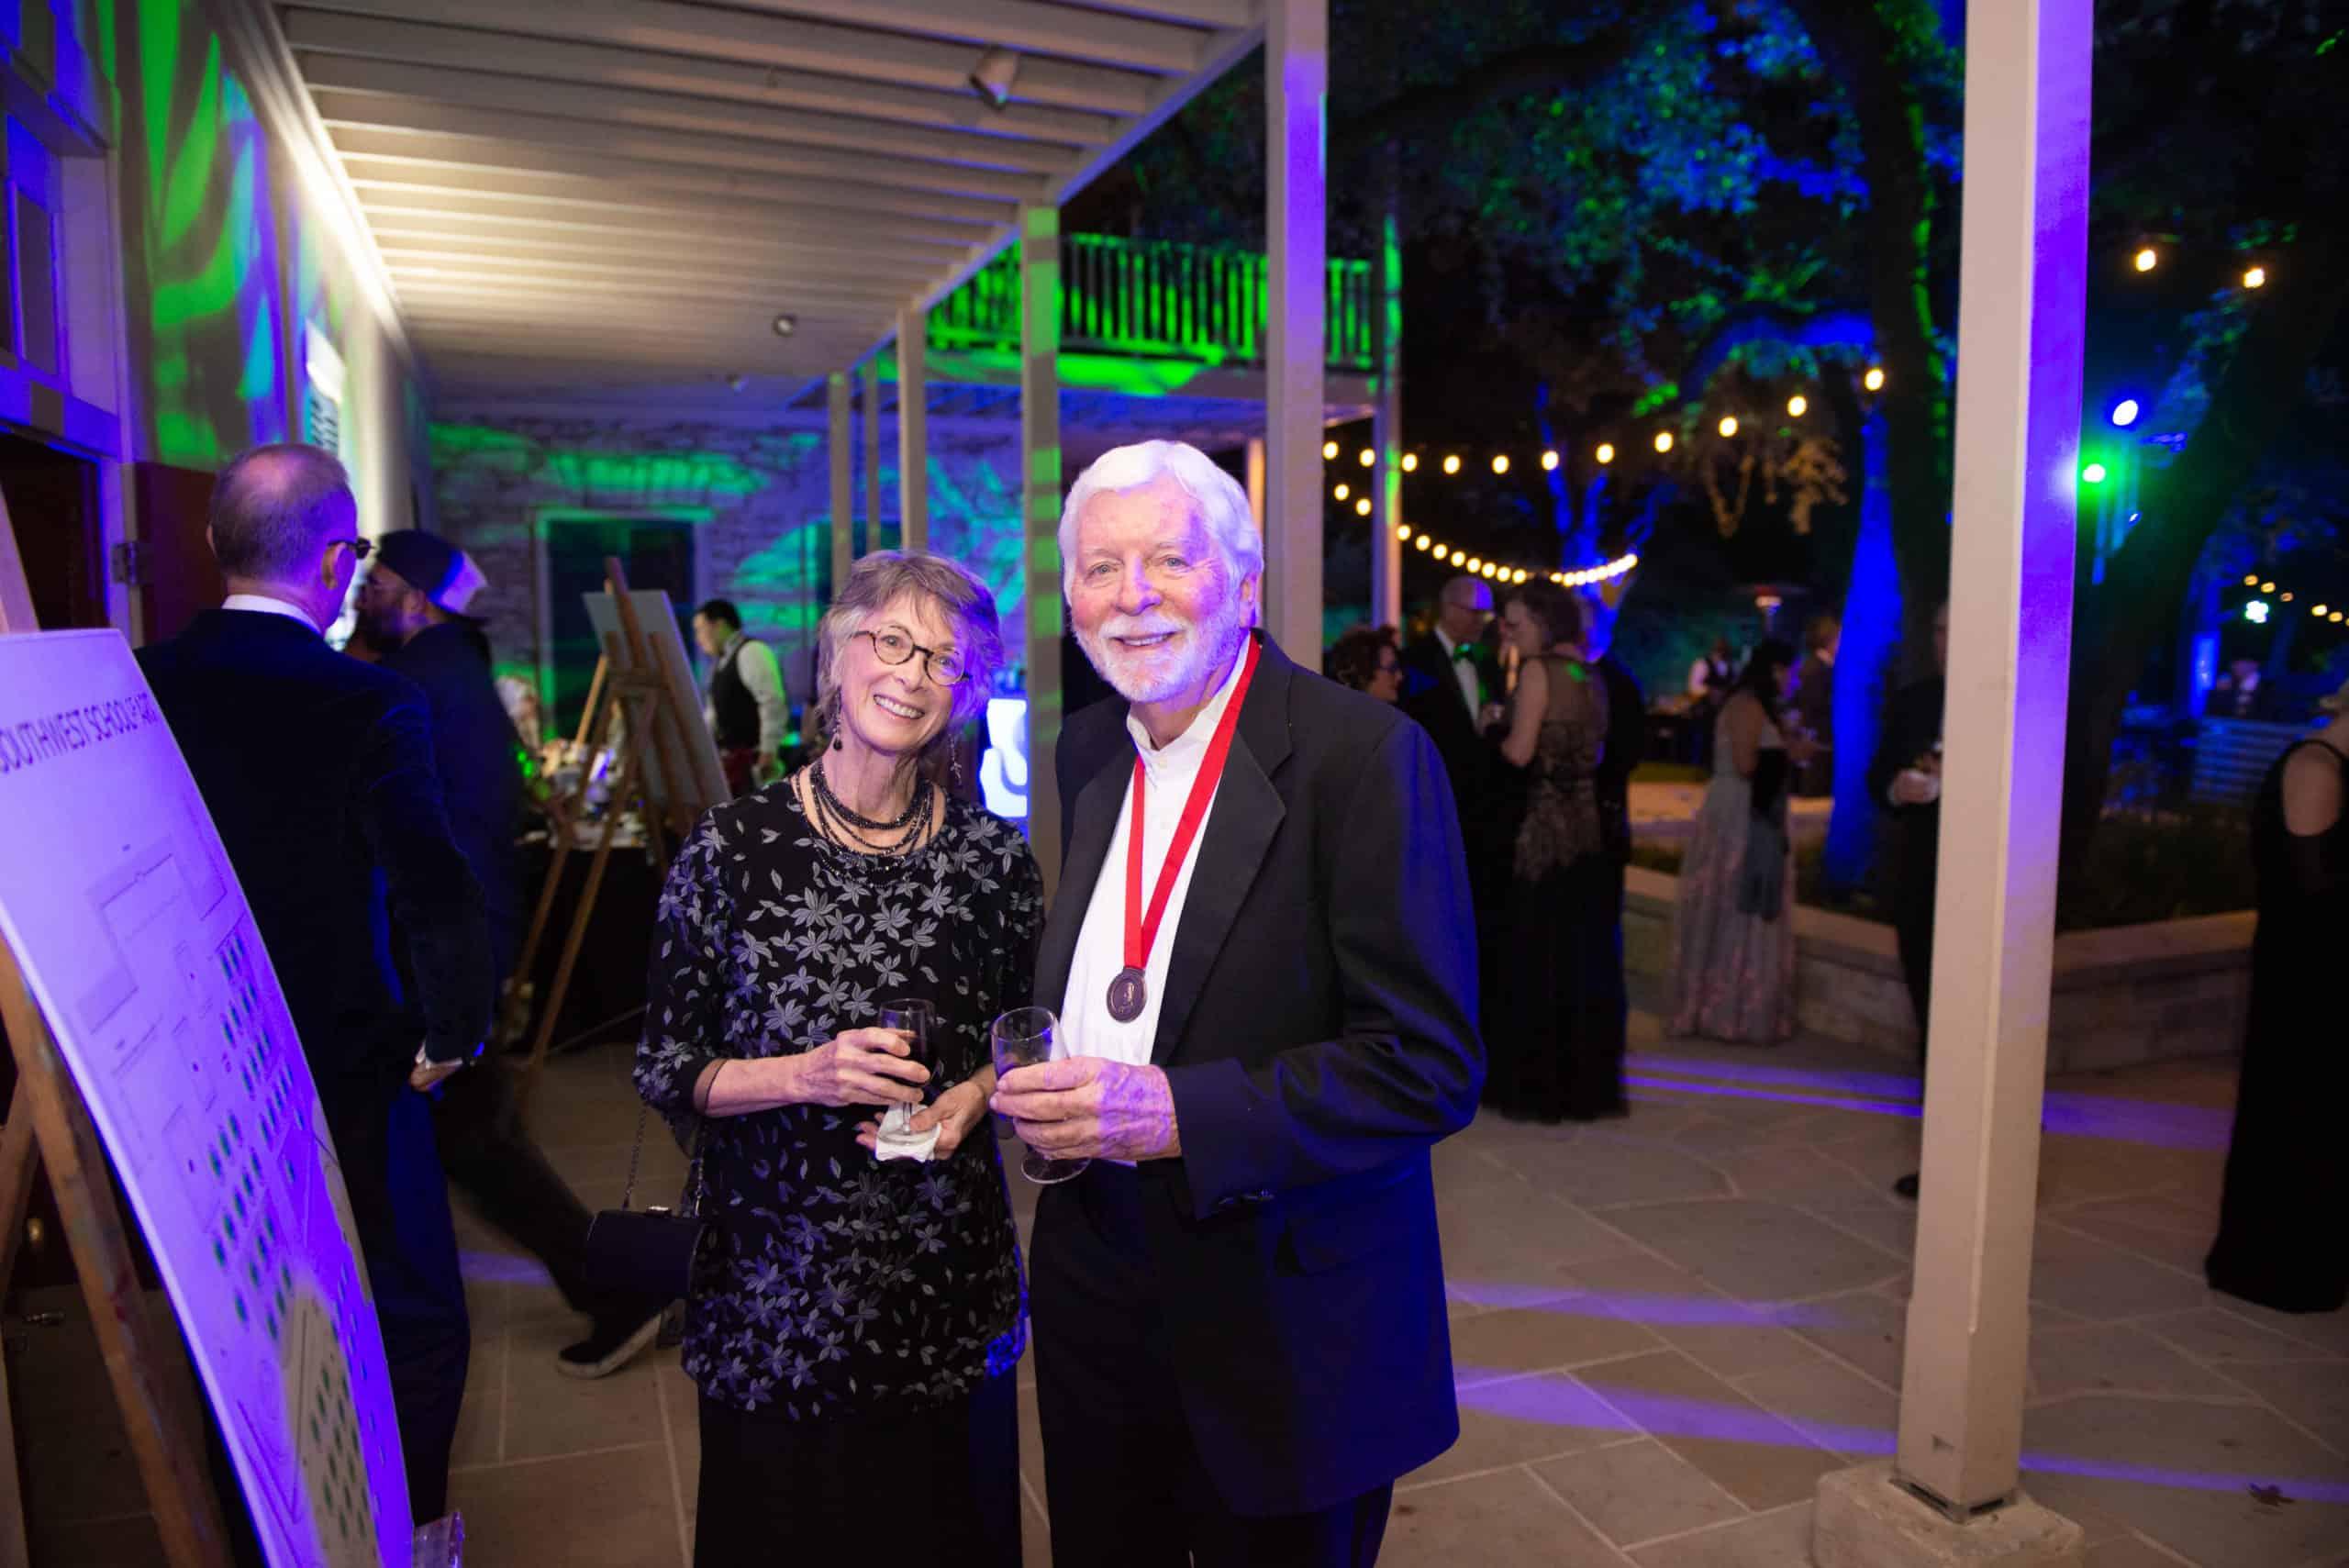 Jane Scroggs and Sinclair Black